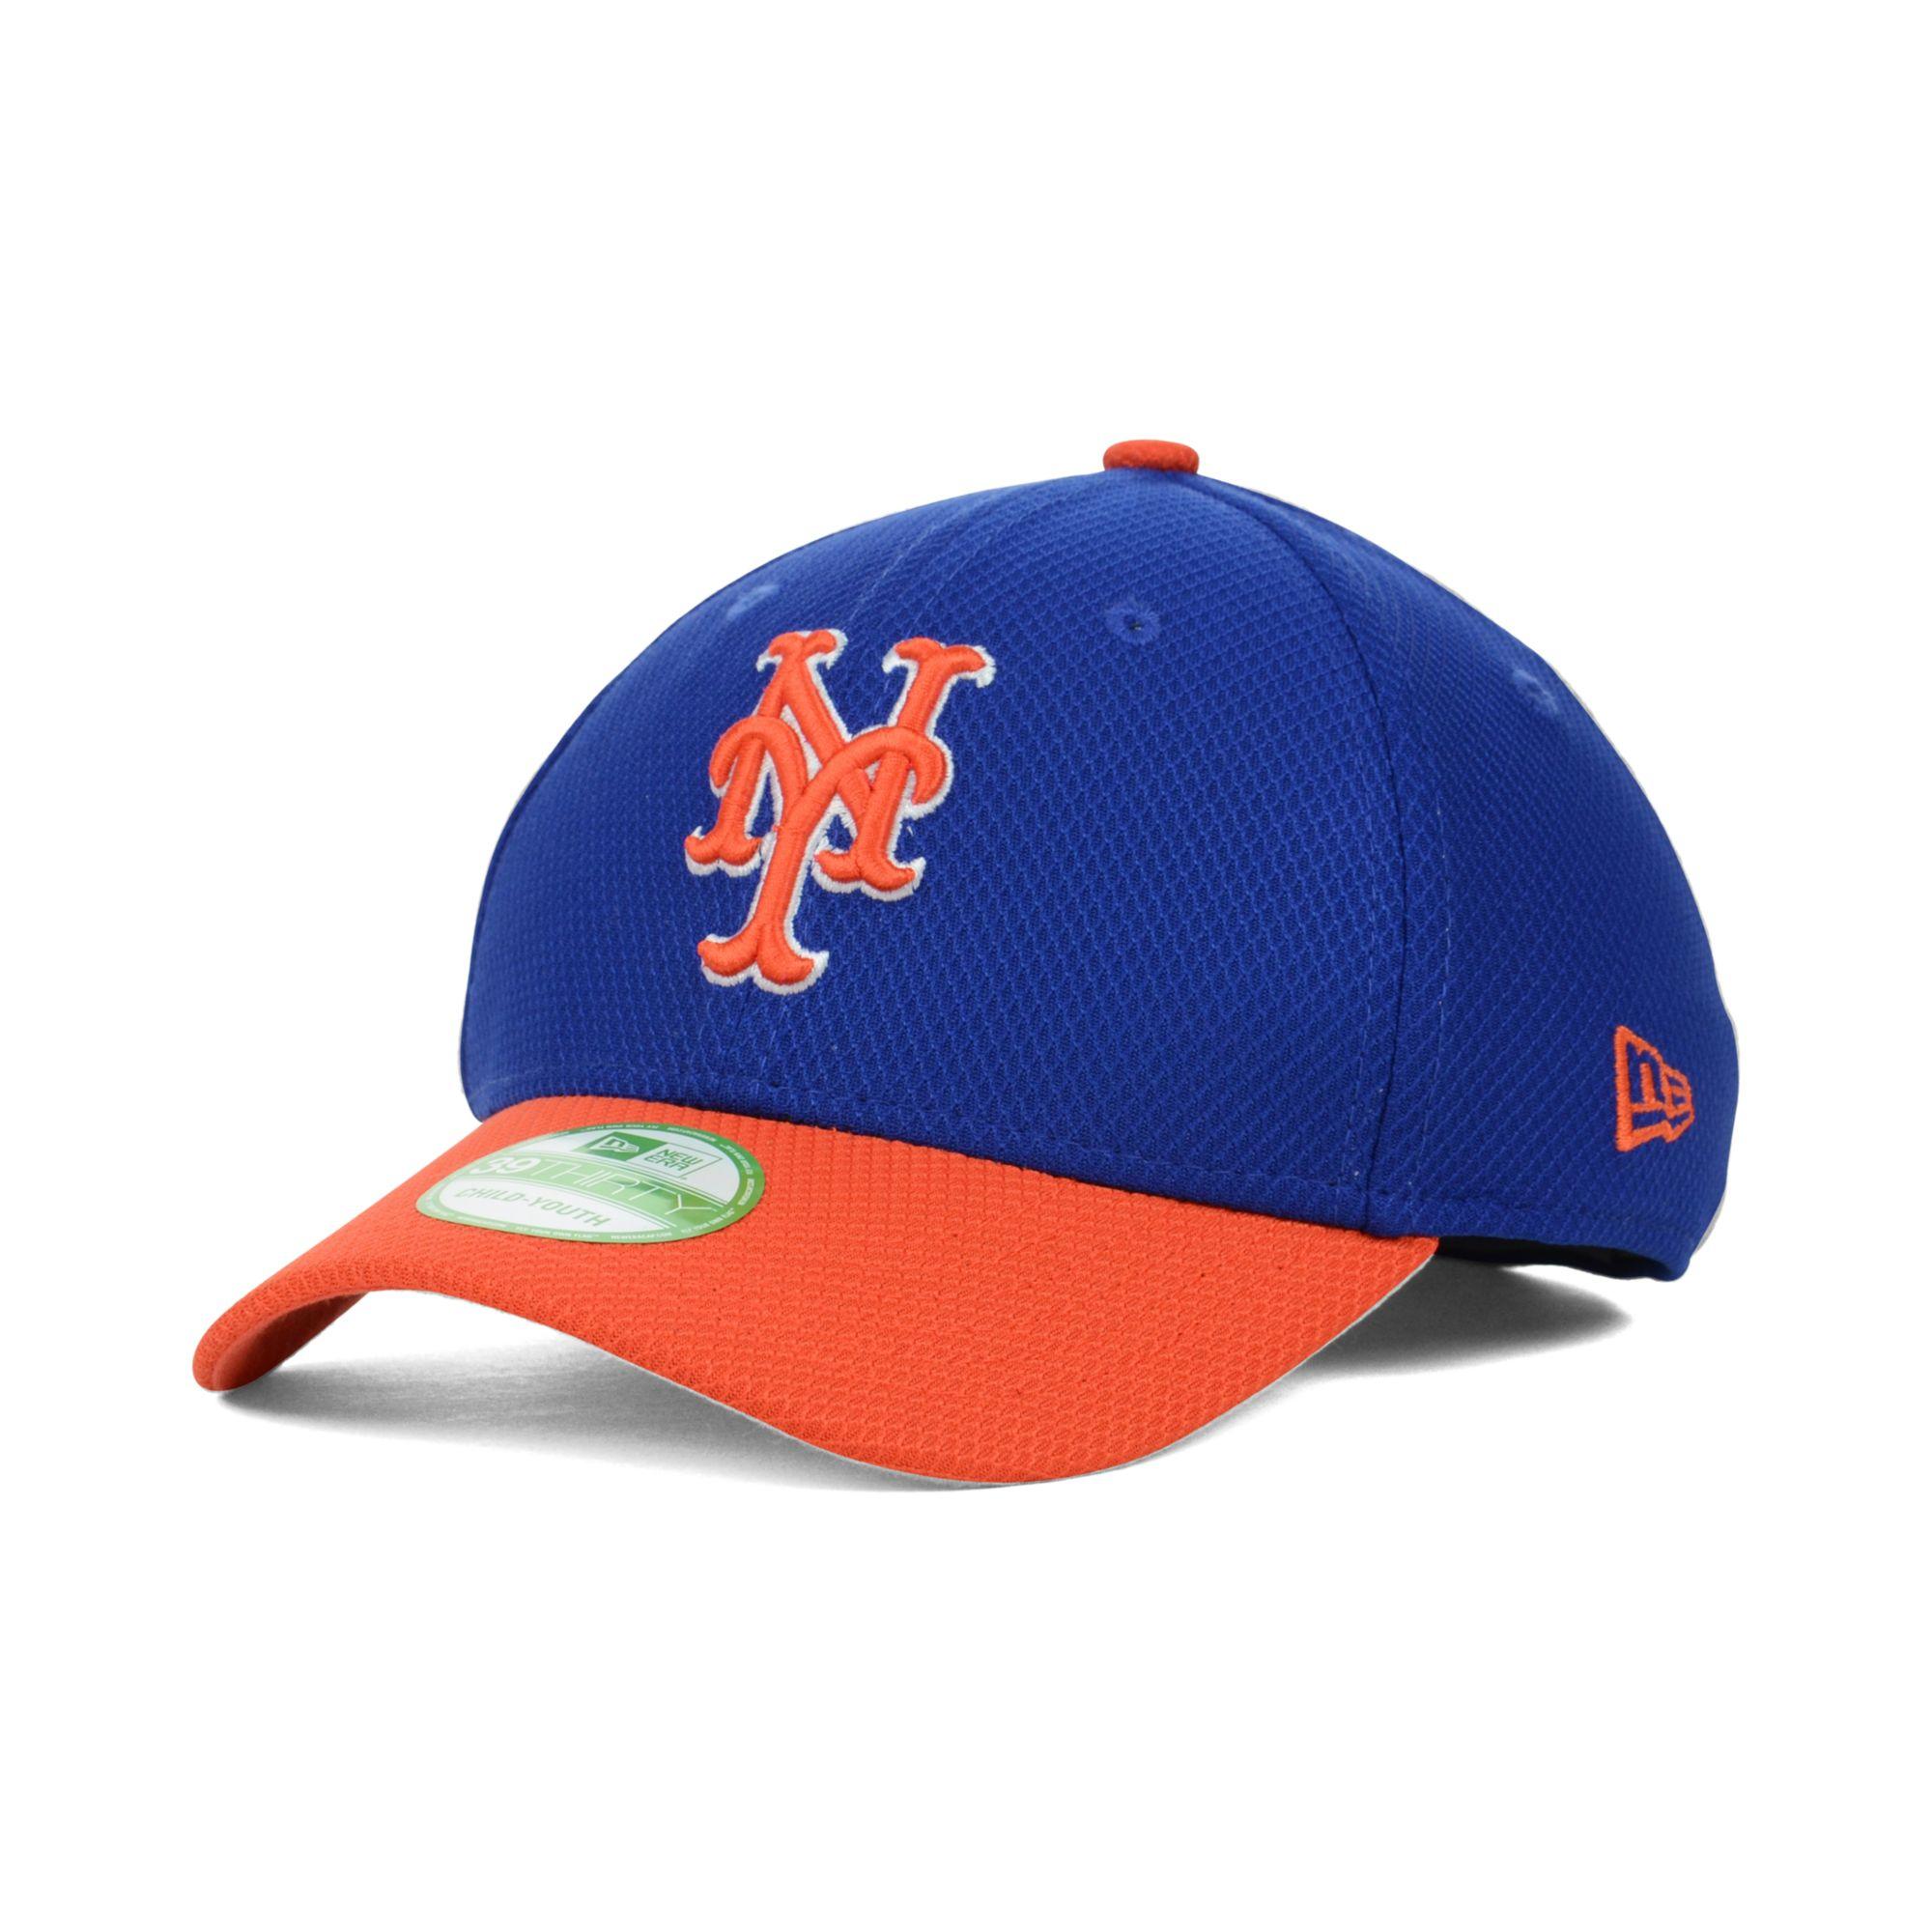 buy popular 18173 67baf ... best price lyst ktz kids new york mets diamond era 39thirty cap in blue  for men